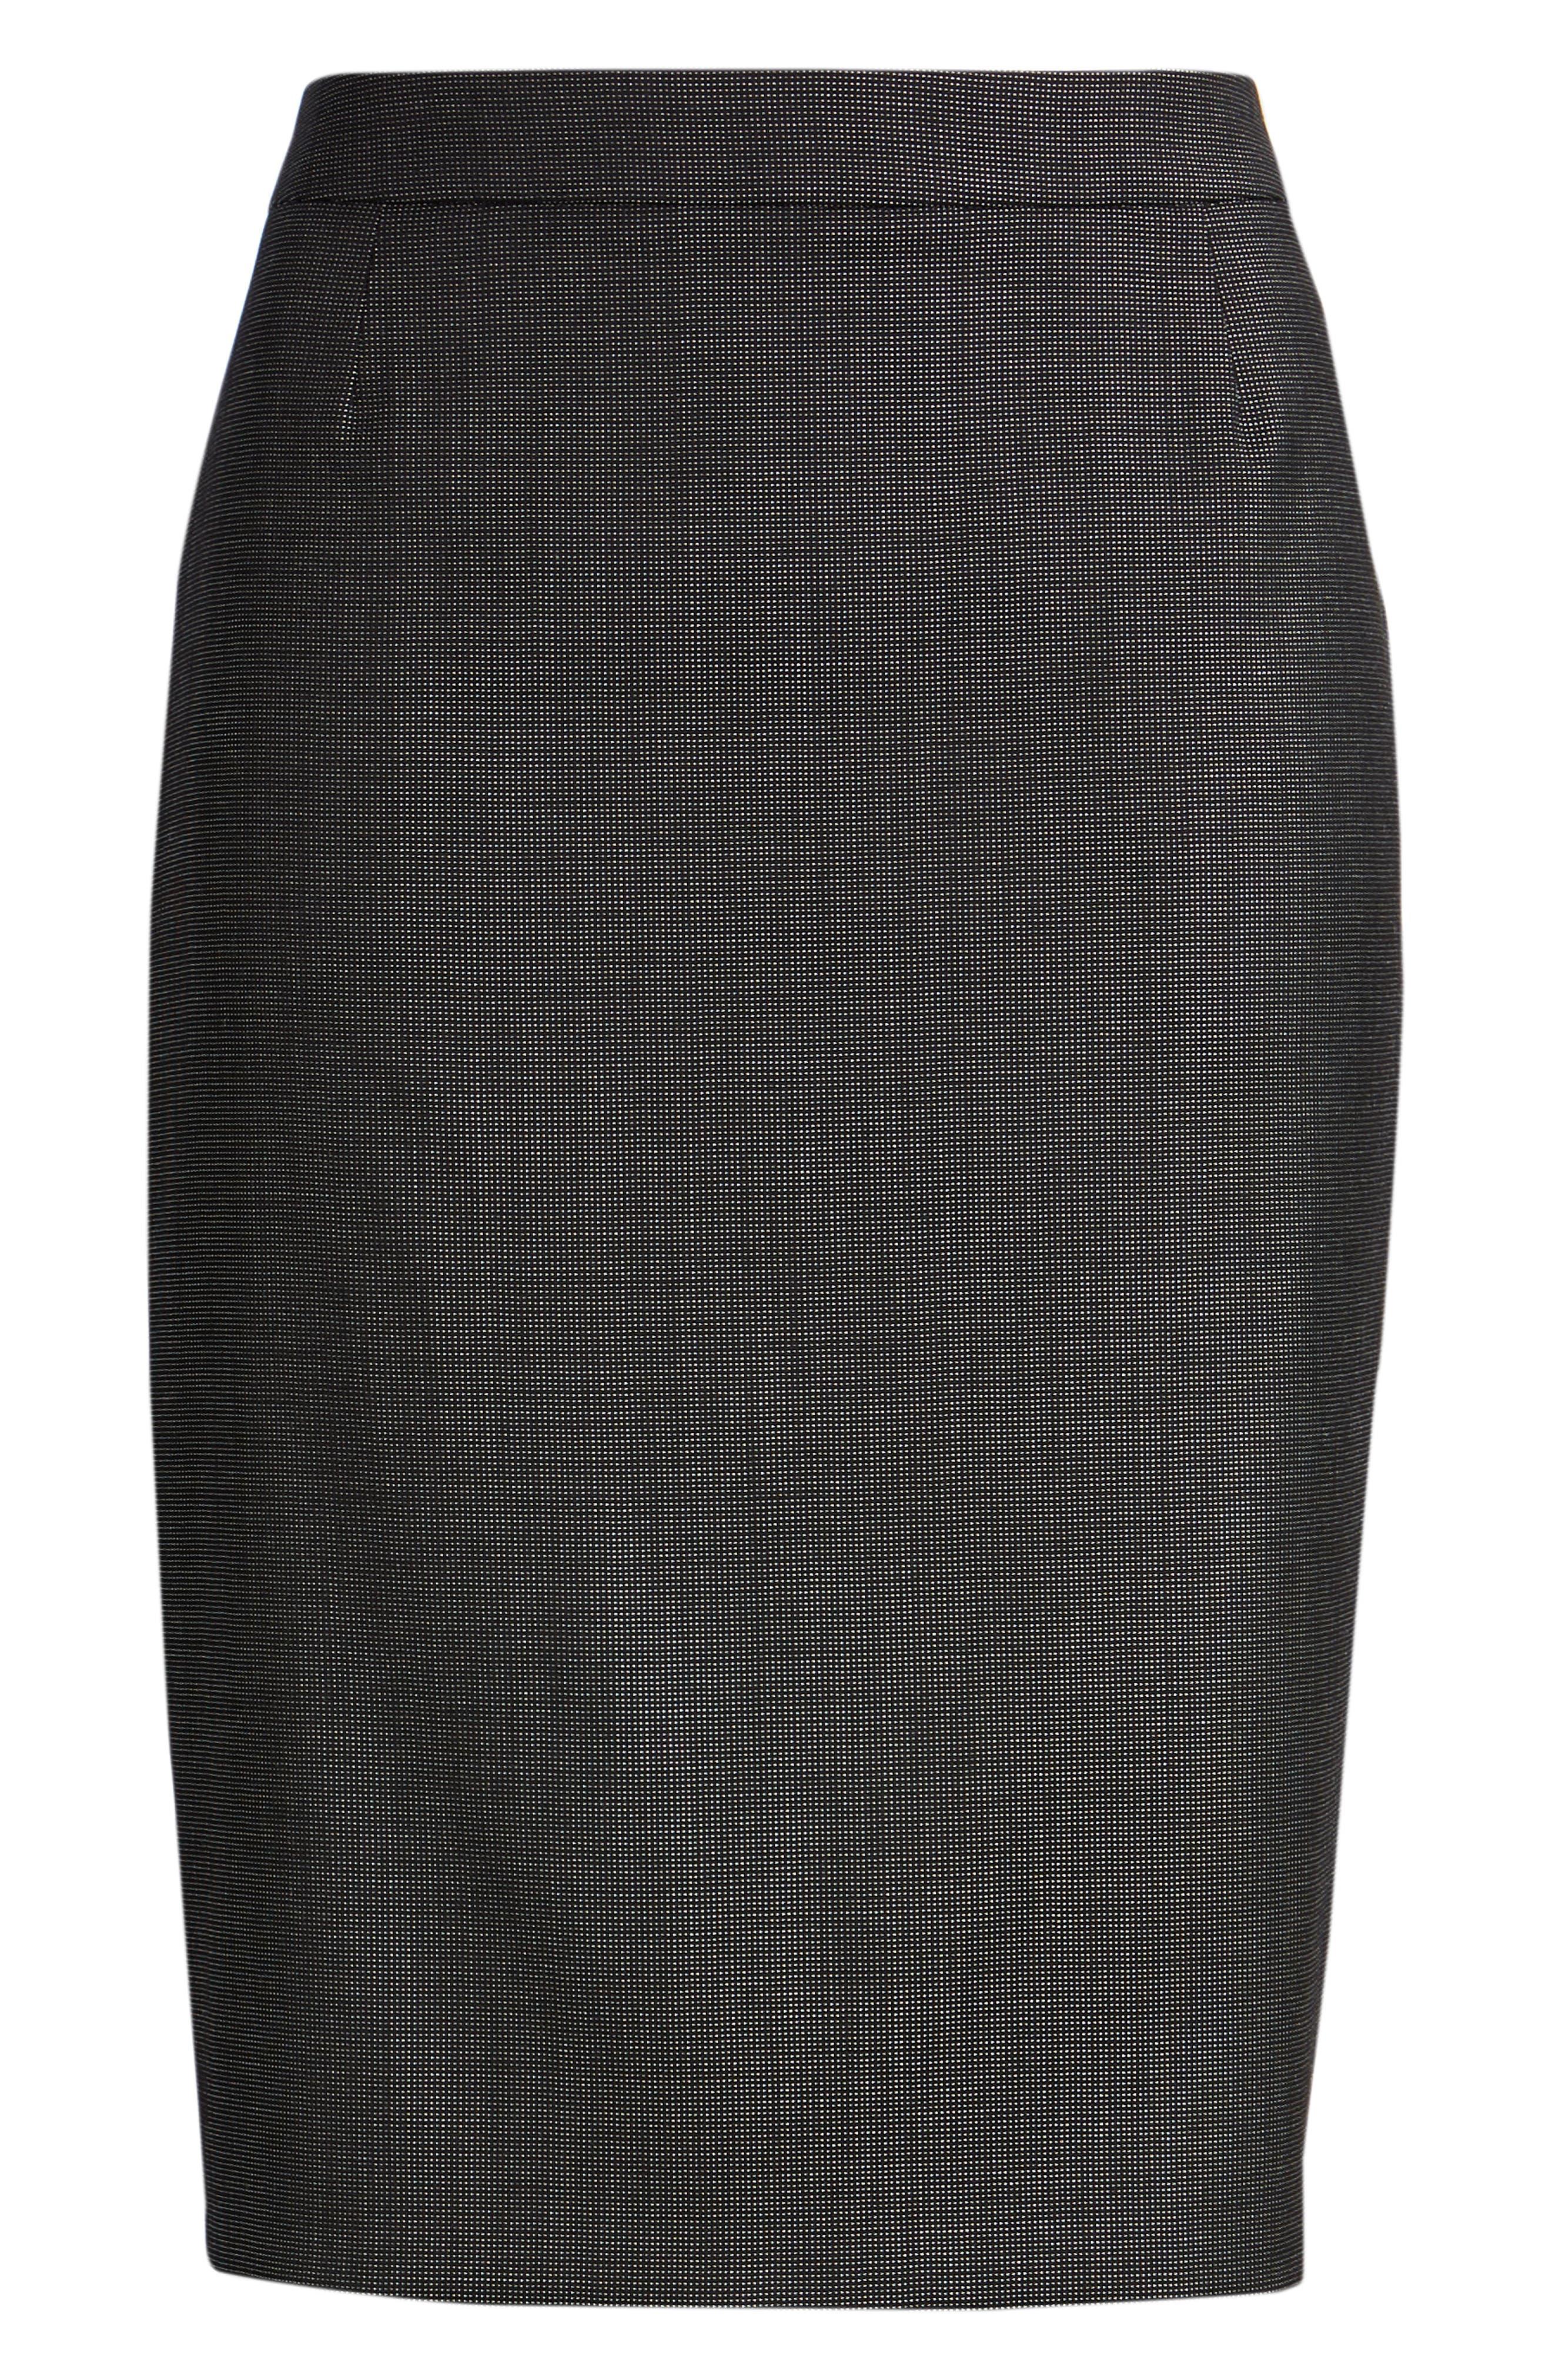 Vimena Stretch Wool Blend Suit Skirt,                             Alternate thumbnail 6, color,                             009